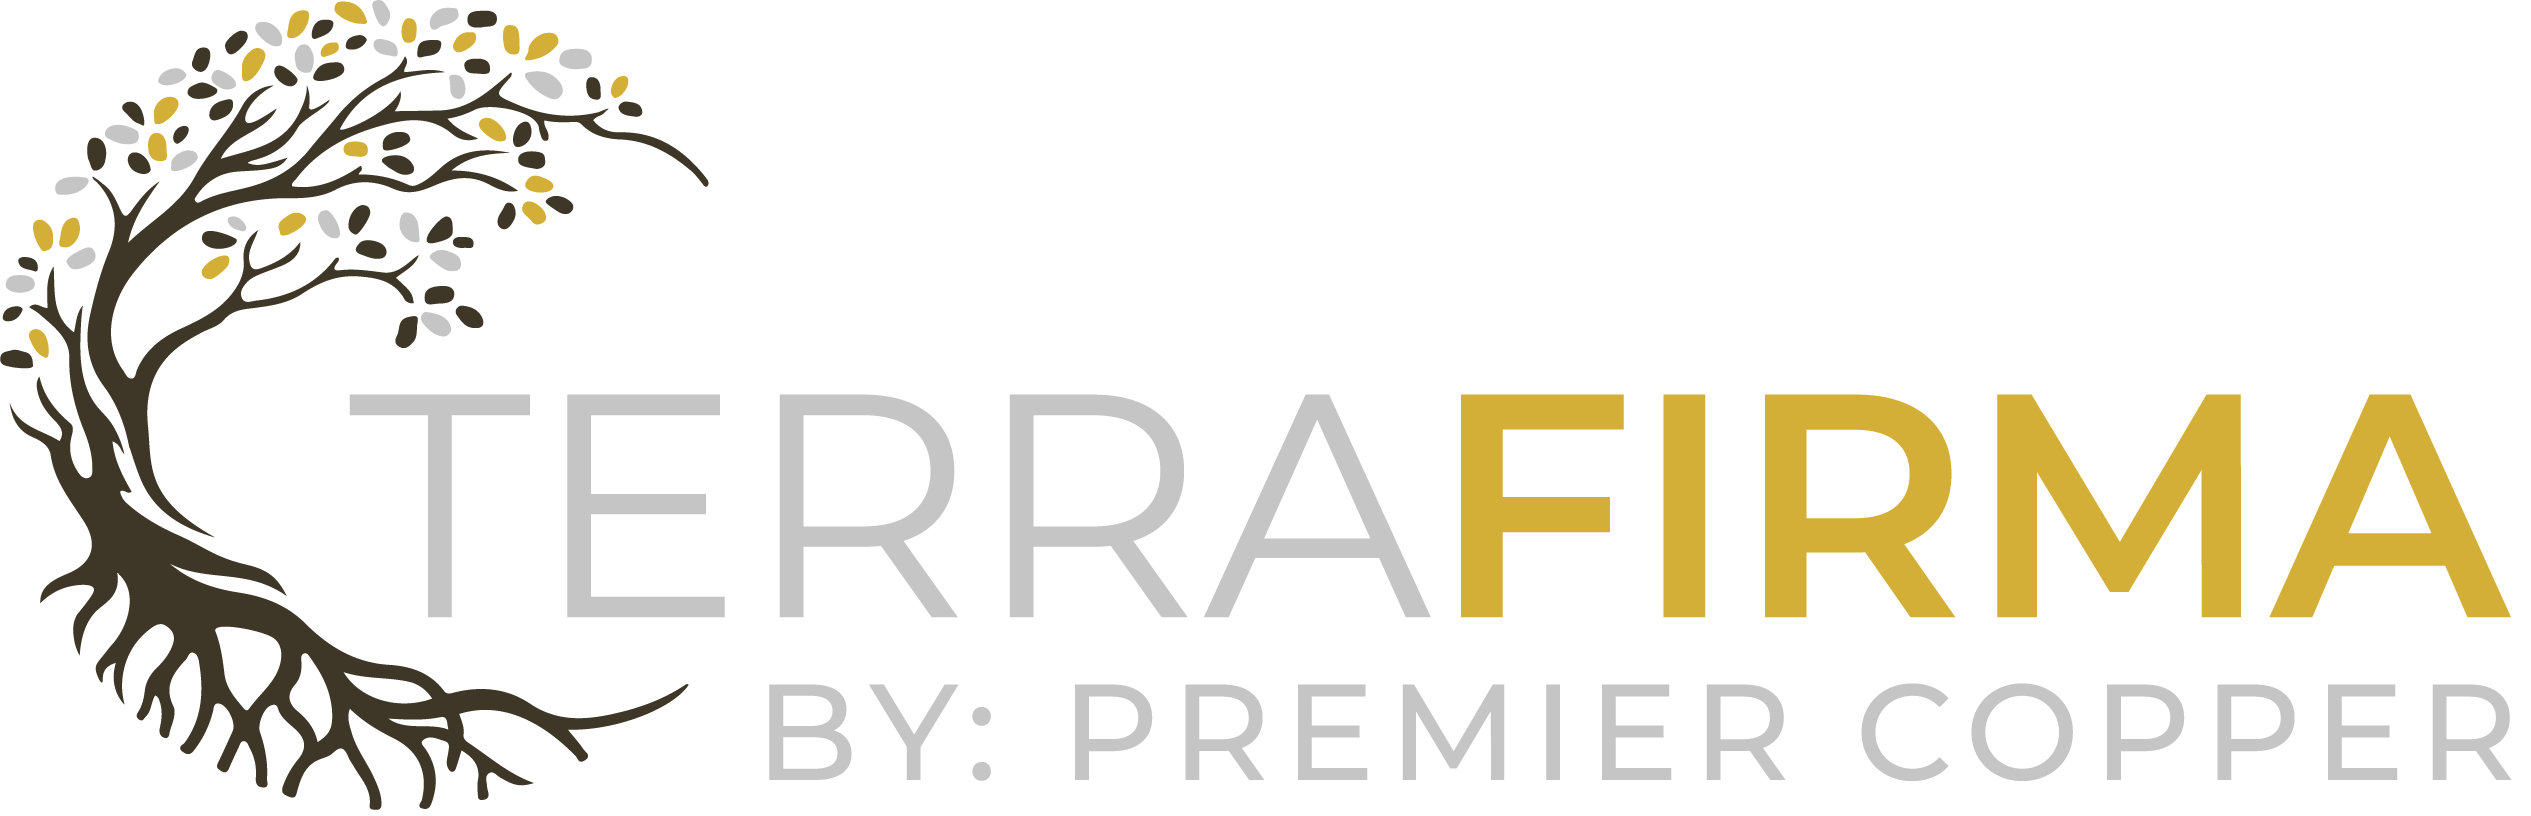 TerraFirma by Premier Copper logo